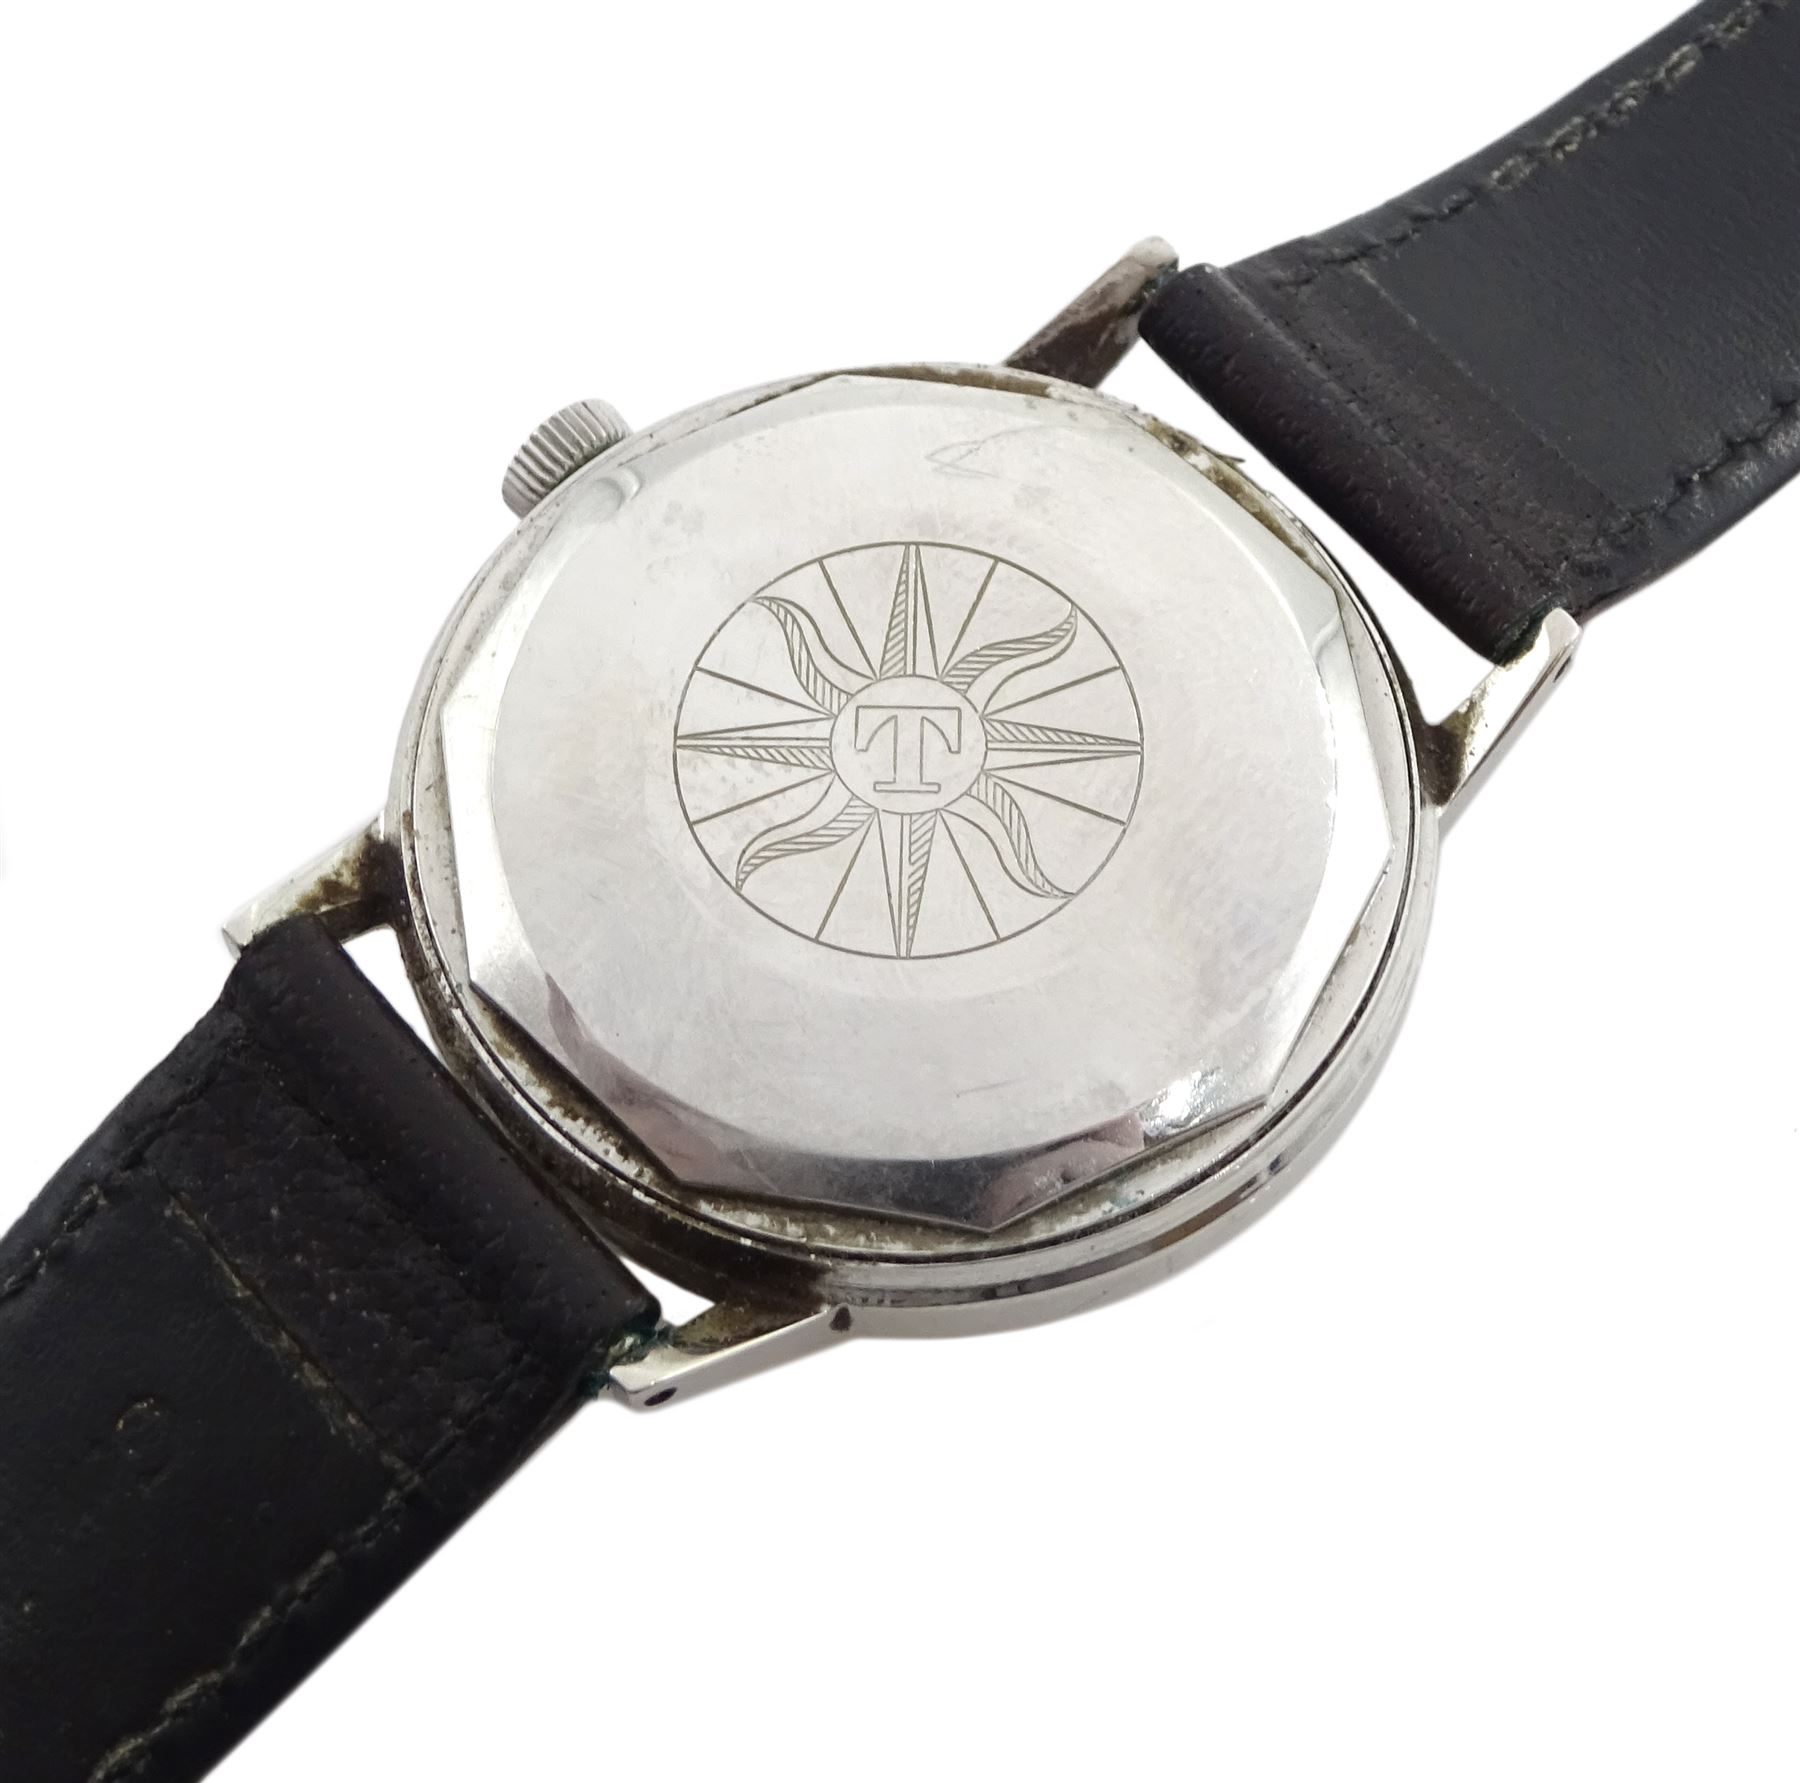 Tissot Automatic Seastar gentleman's stainless steel wristwatch No. 43540 - Image 3 of 3